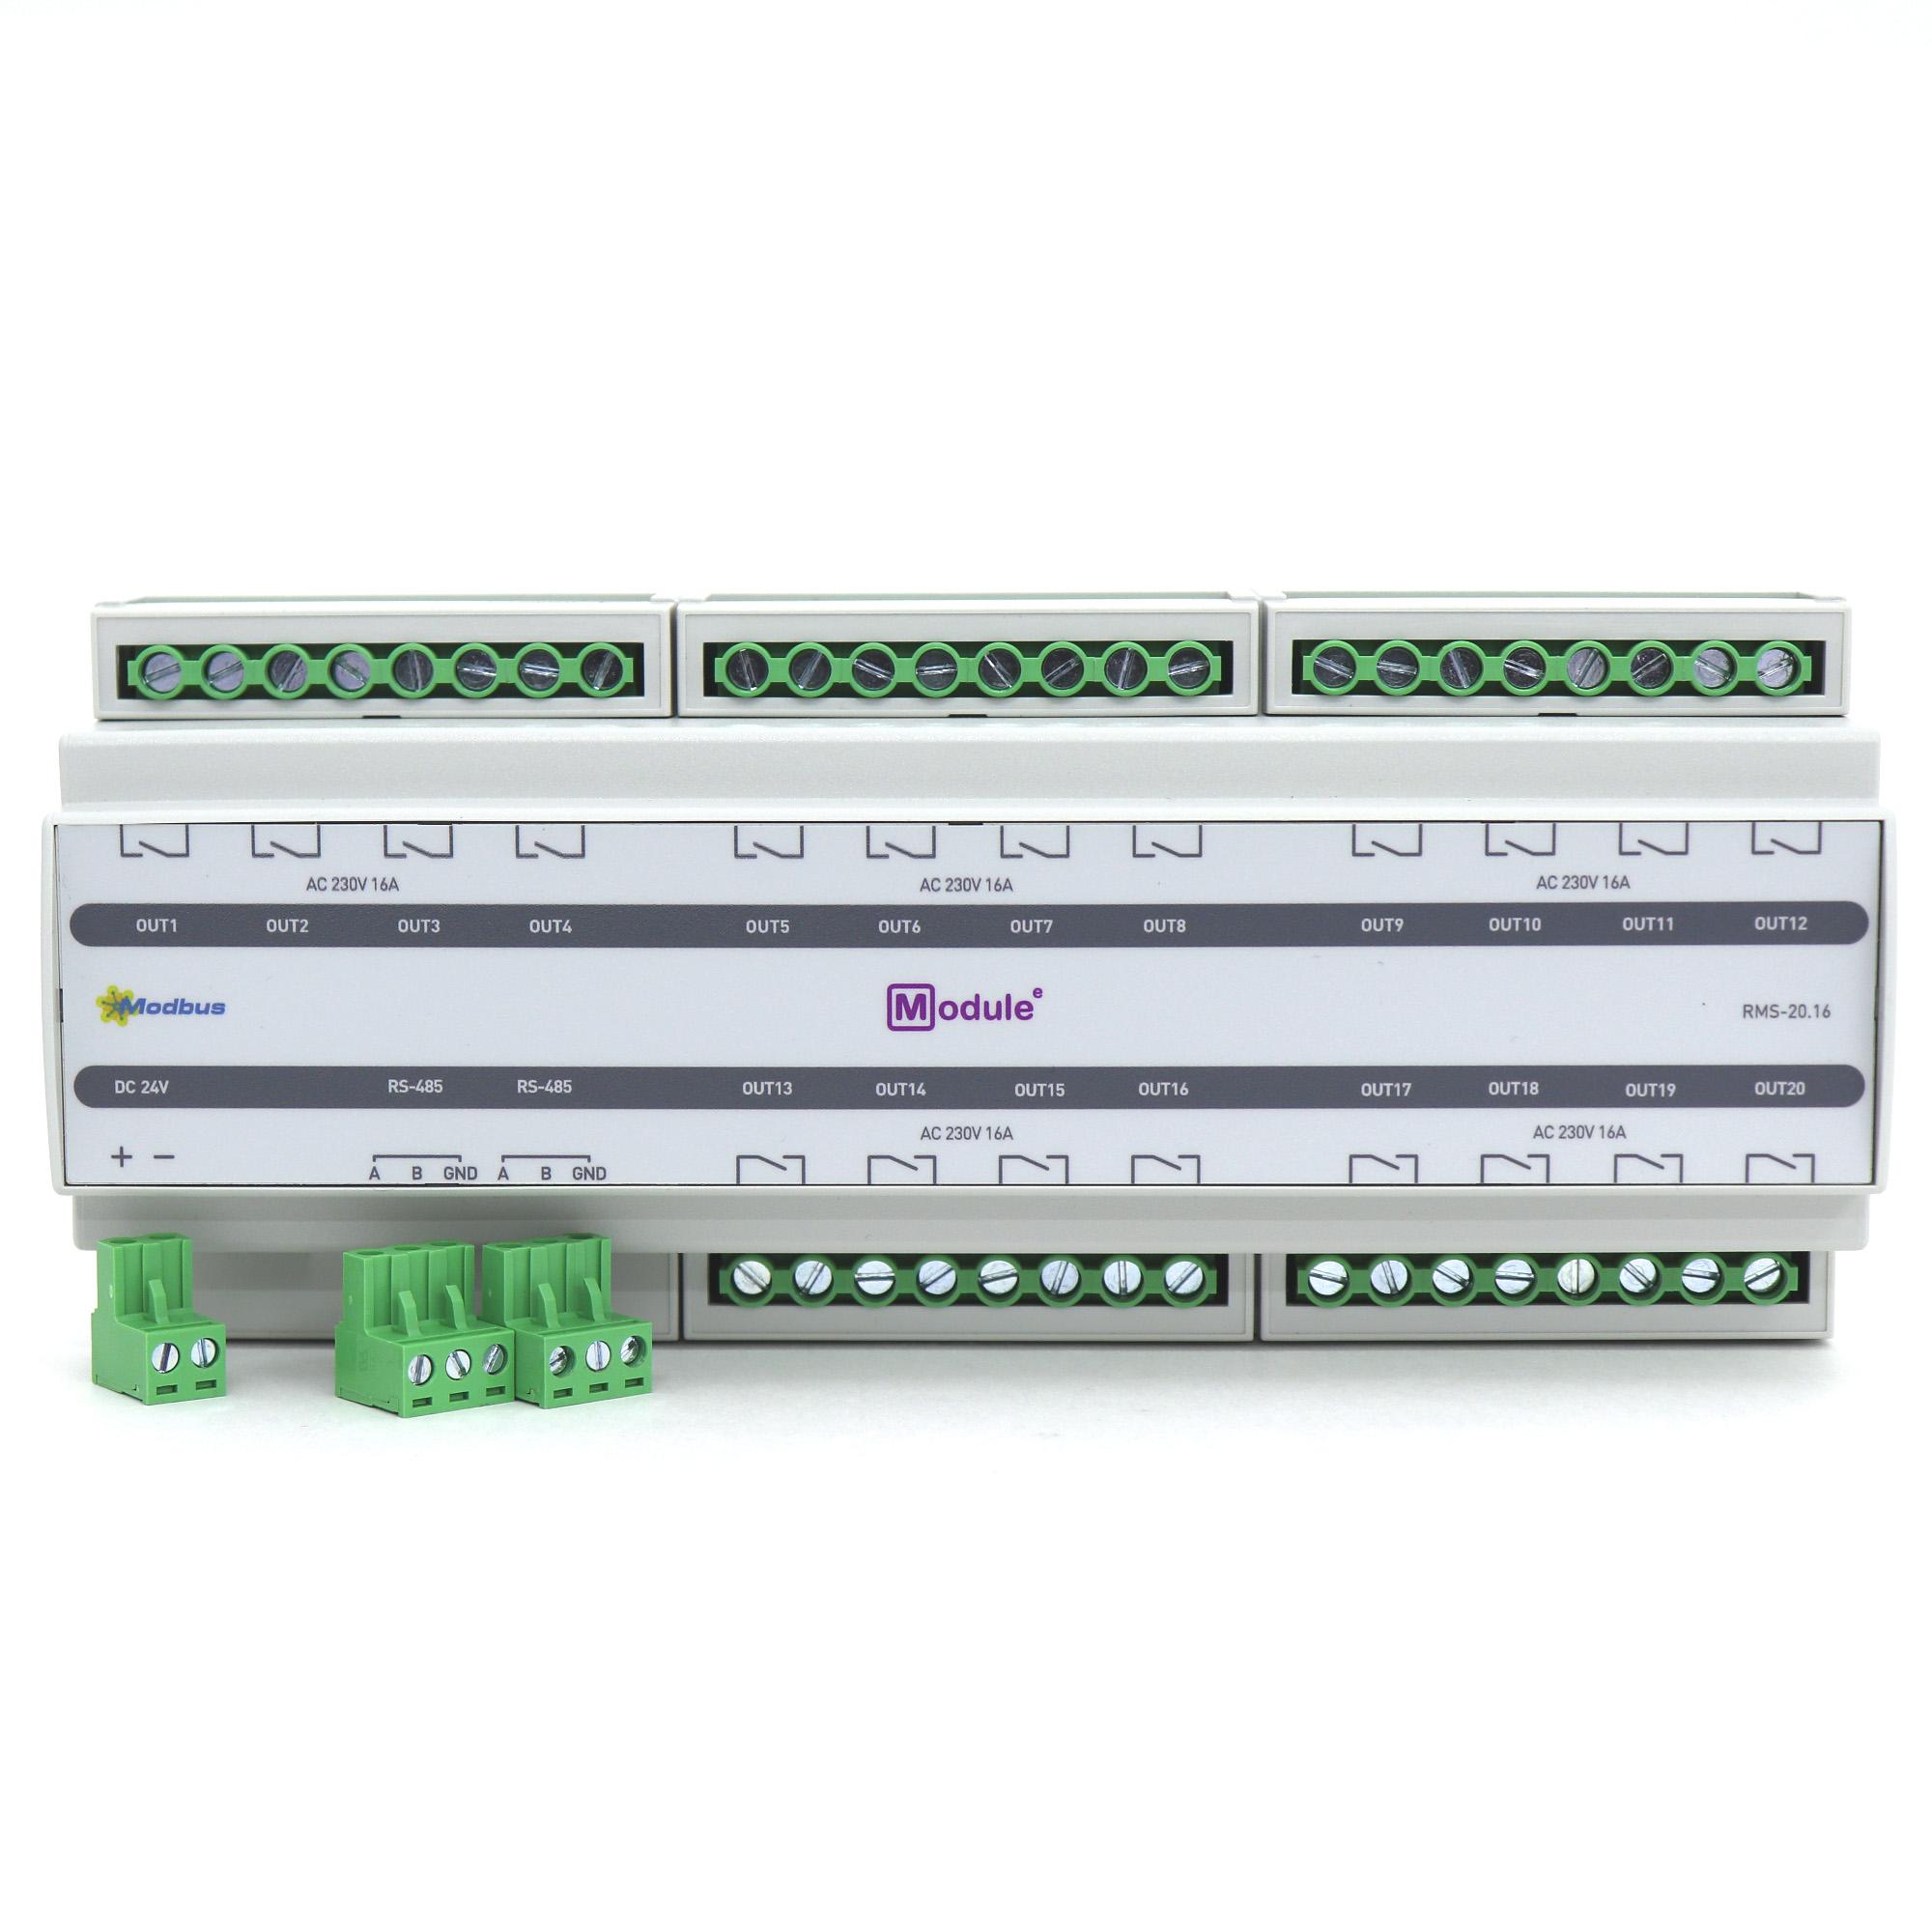 RMS-20.16, Modbus модуль дискретного вывода, 20 каналов 16А